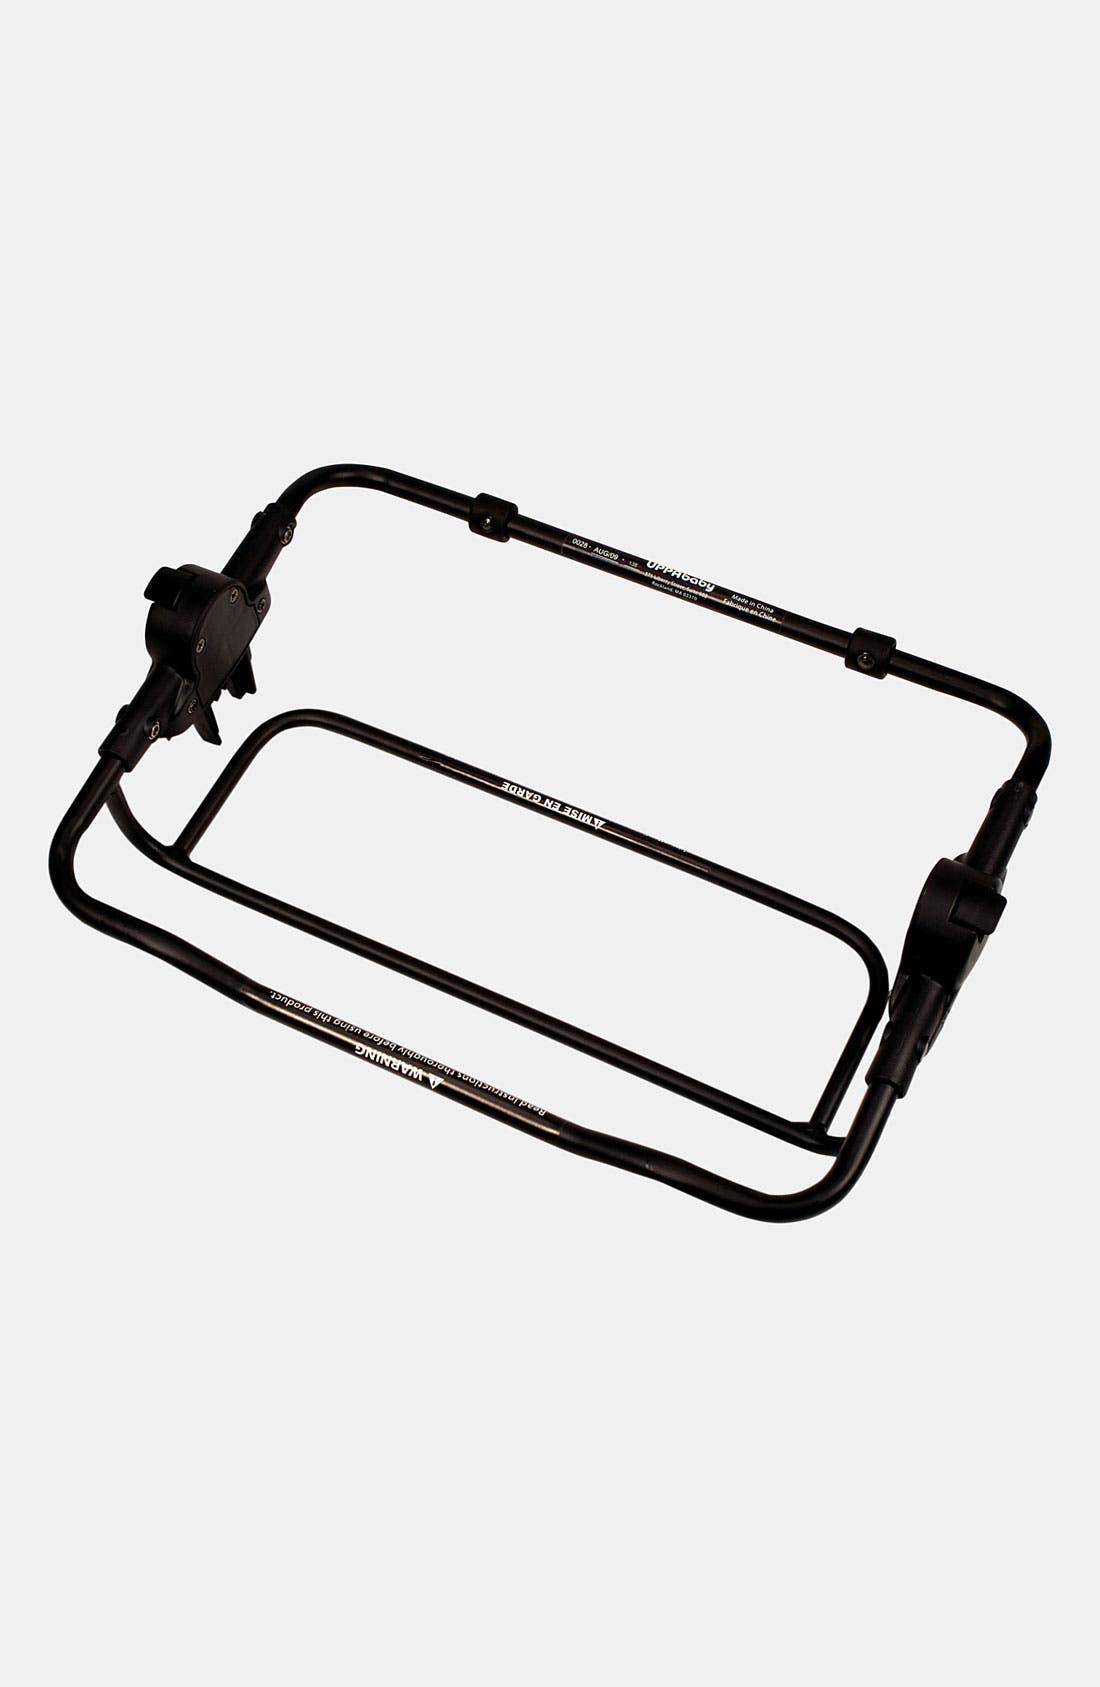 Main Image - UPPAbaby VISTA Stroller to Peg Perego™ Car Seat Adaptor